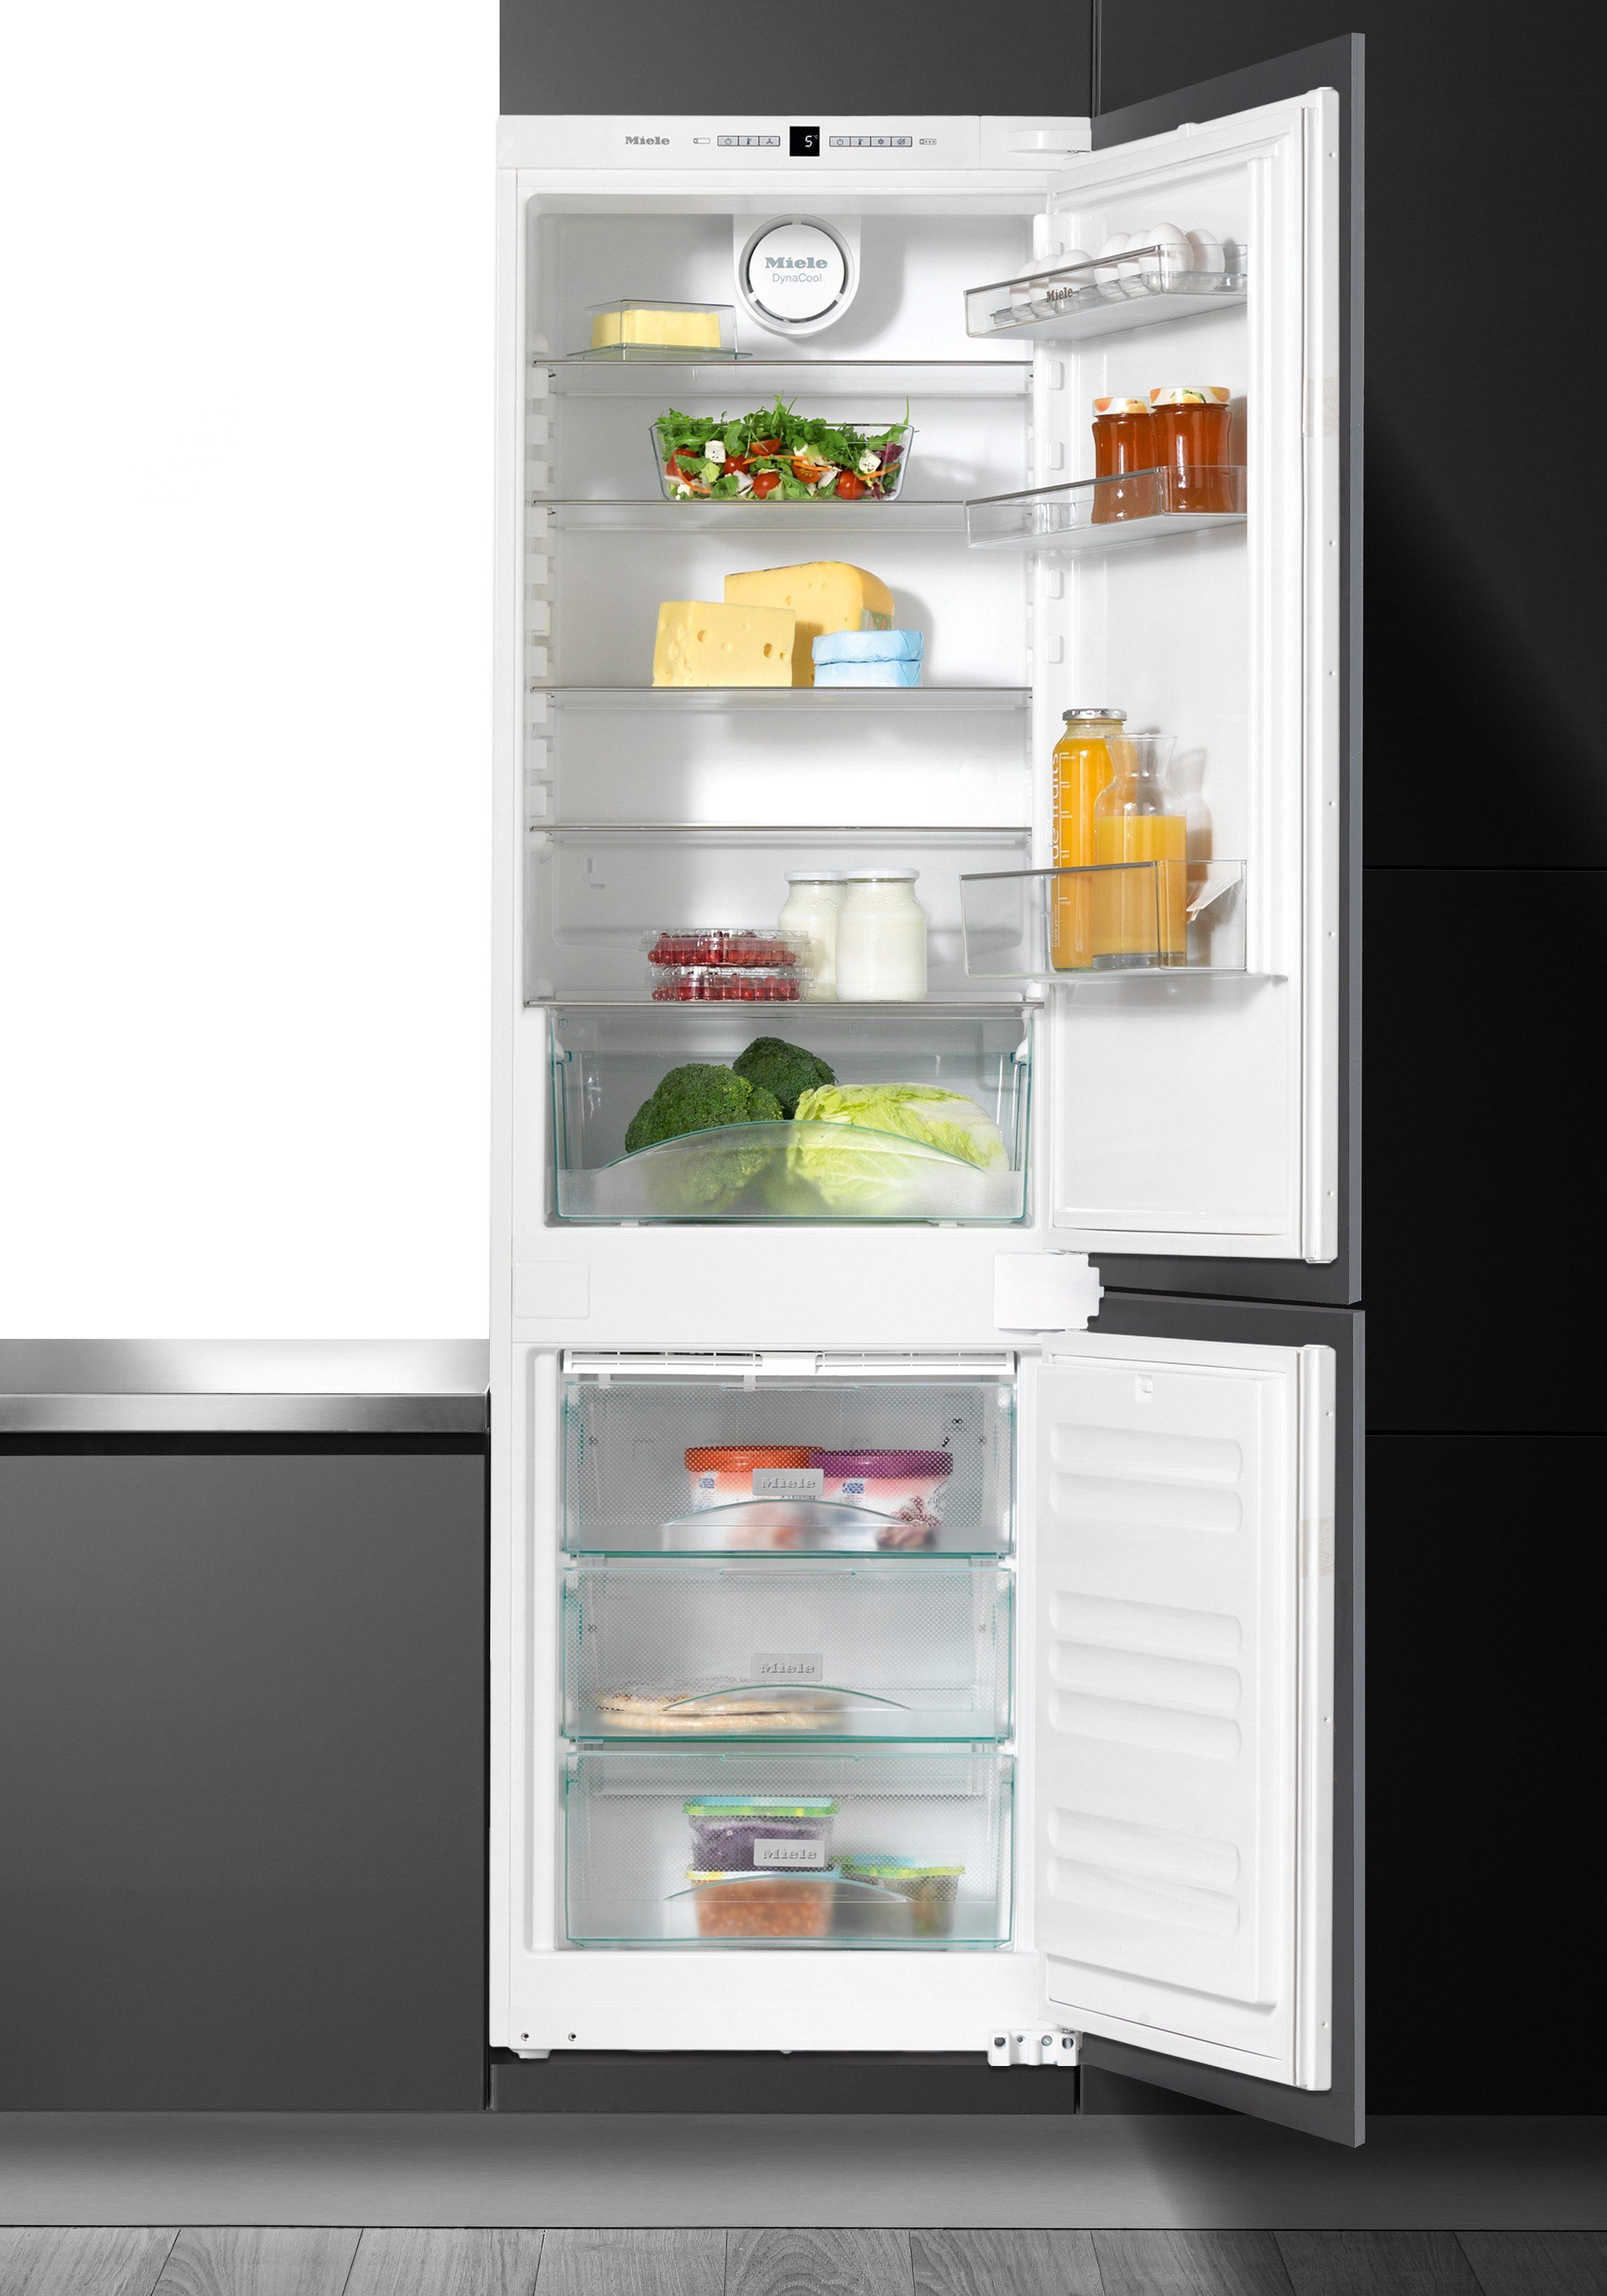 Miele integrierbare Einbau-Kühl-Gefrier-Kombination KF 37132 iD, A++